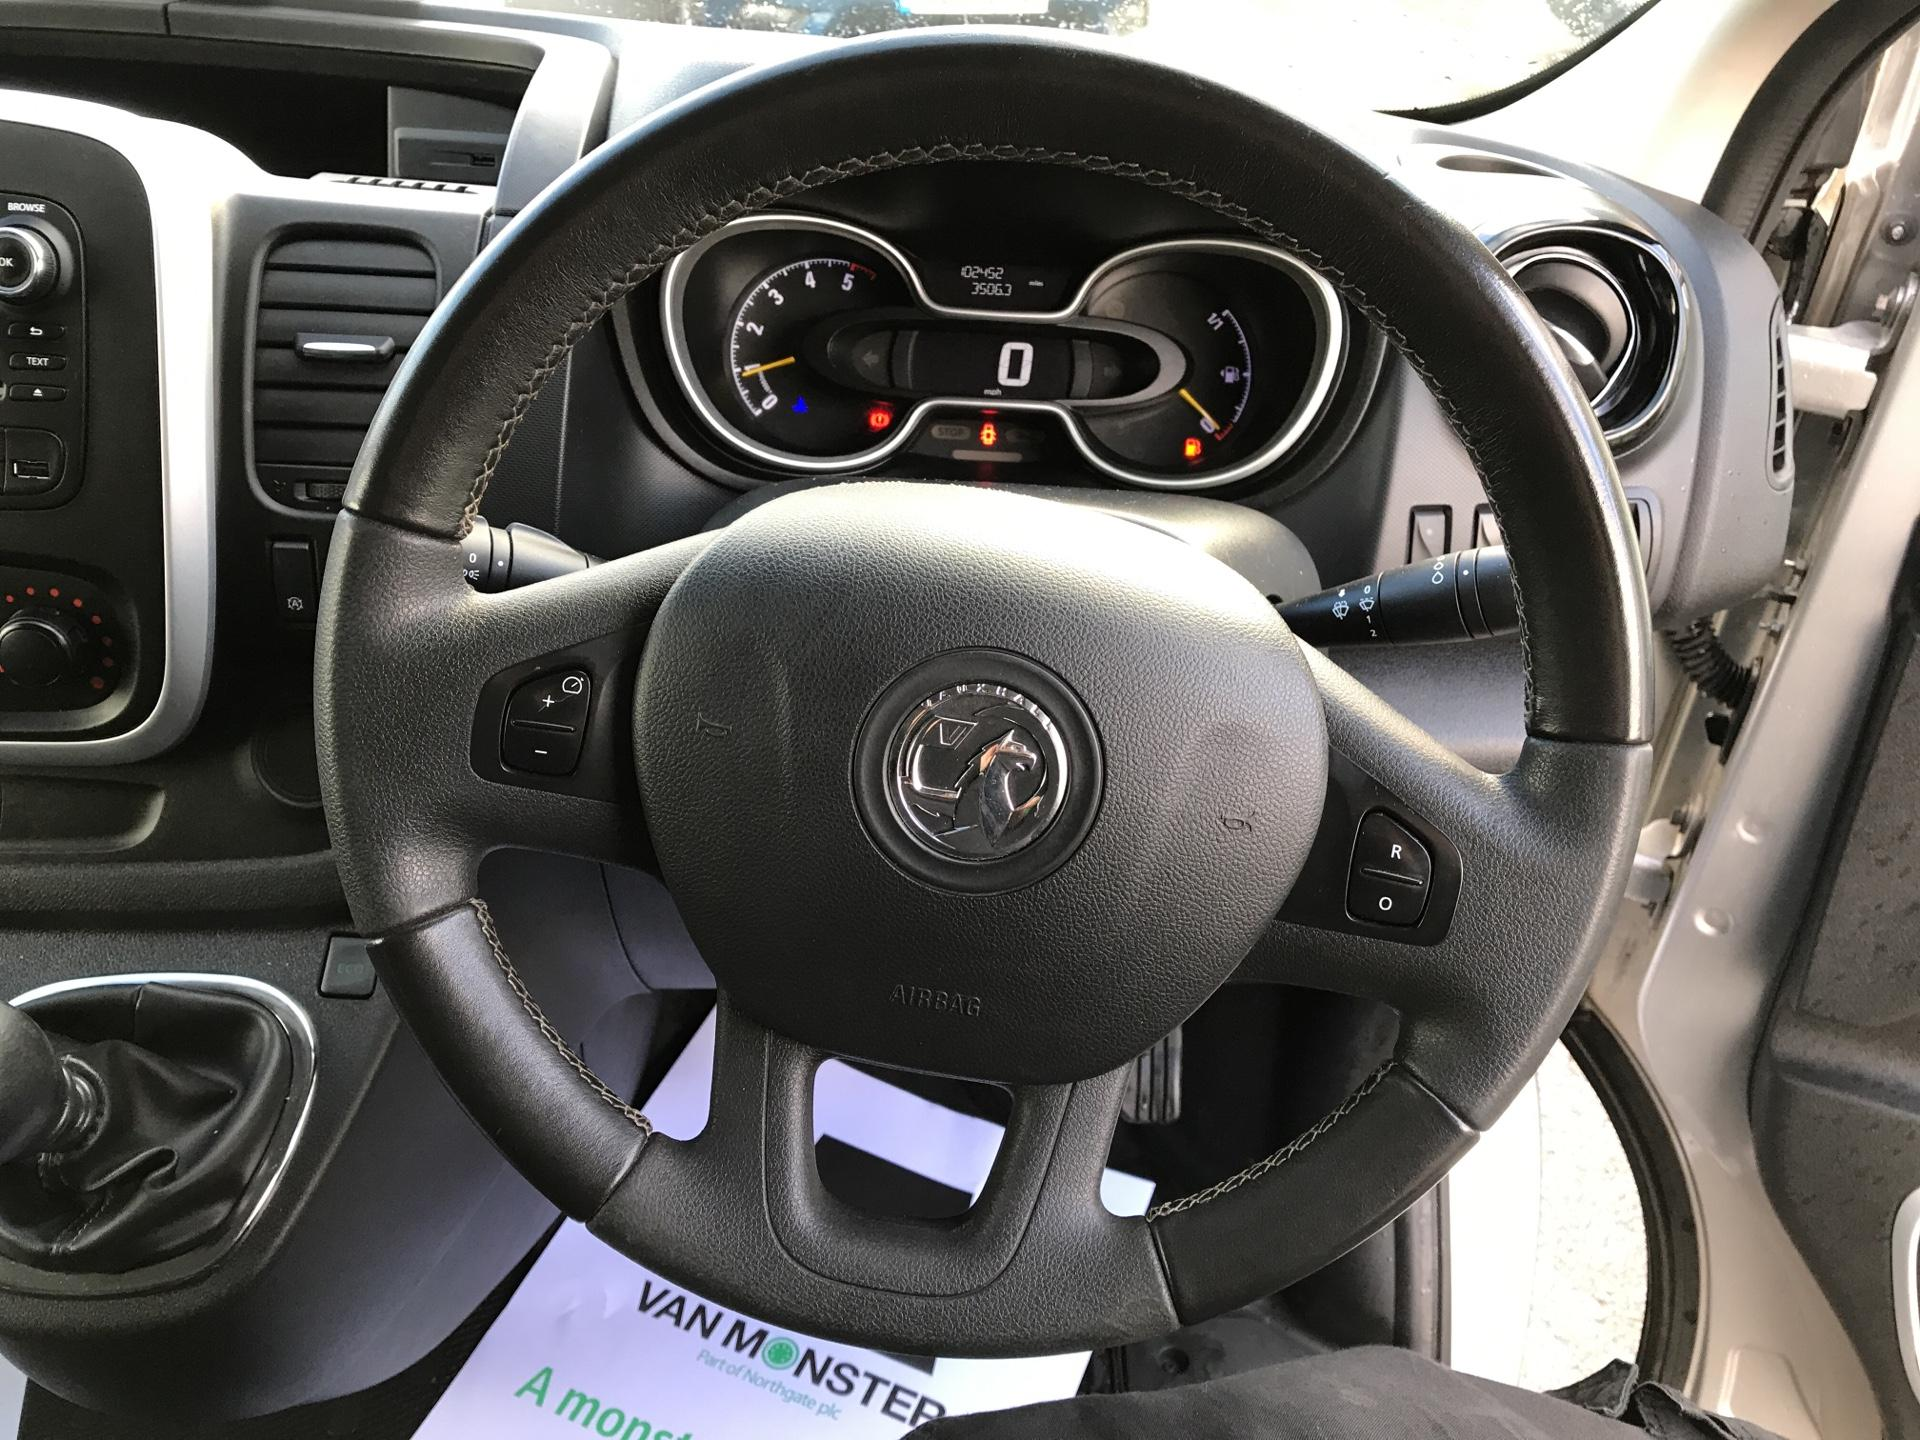 2015 Vauxhall Vivaro L1 H1 2700 1.6 BITURBO 120PS ECOFLEX SPORTIVE EURO 5 (DP15LGO) Image 12